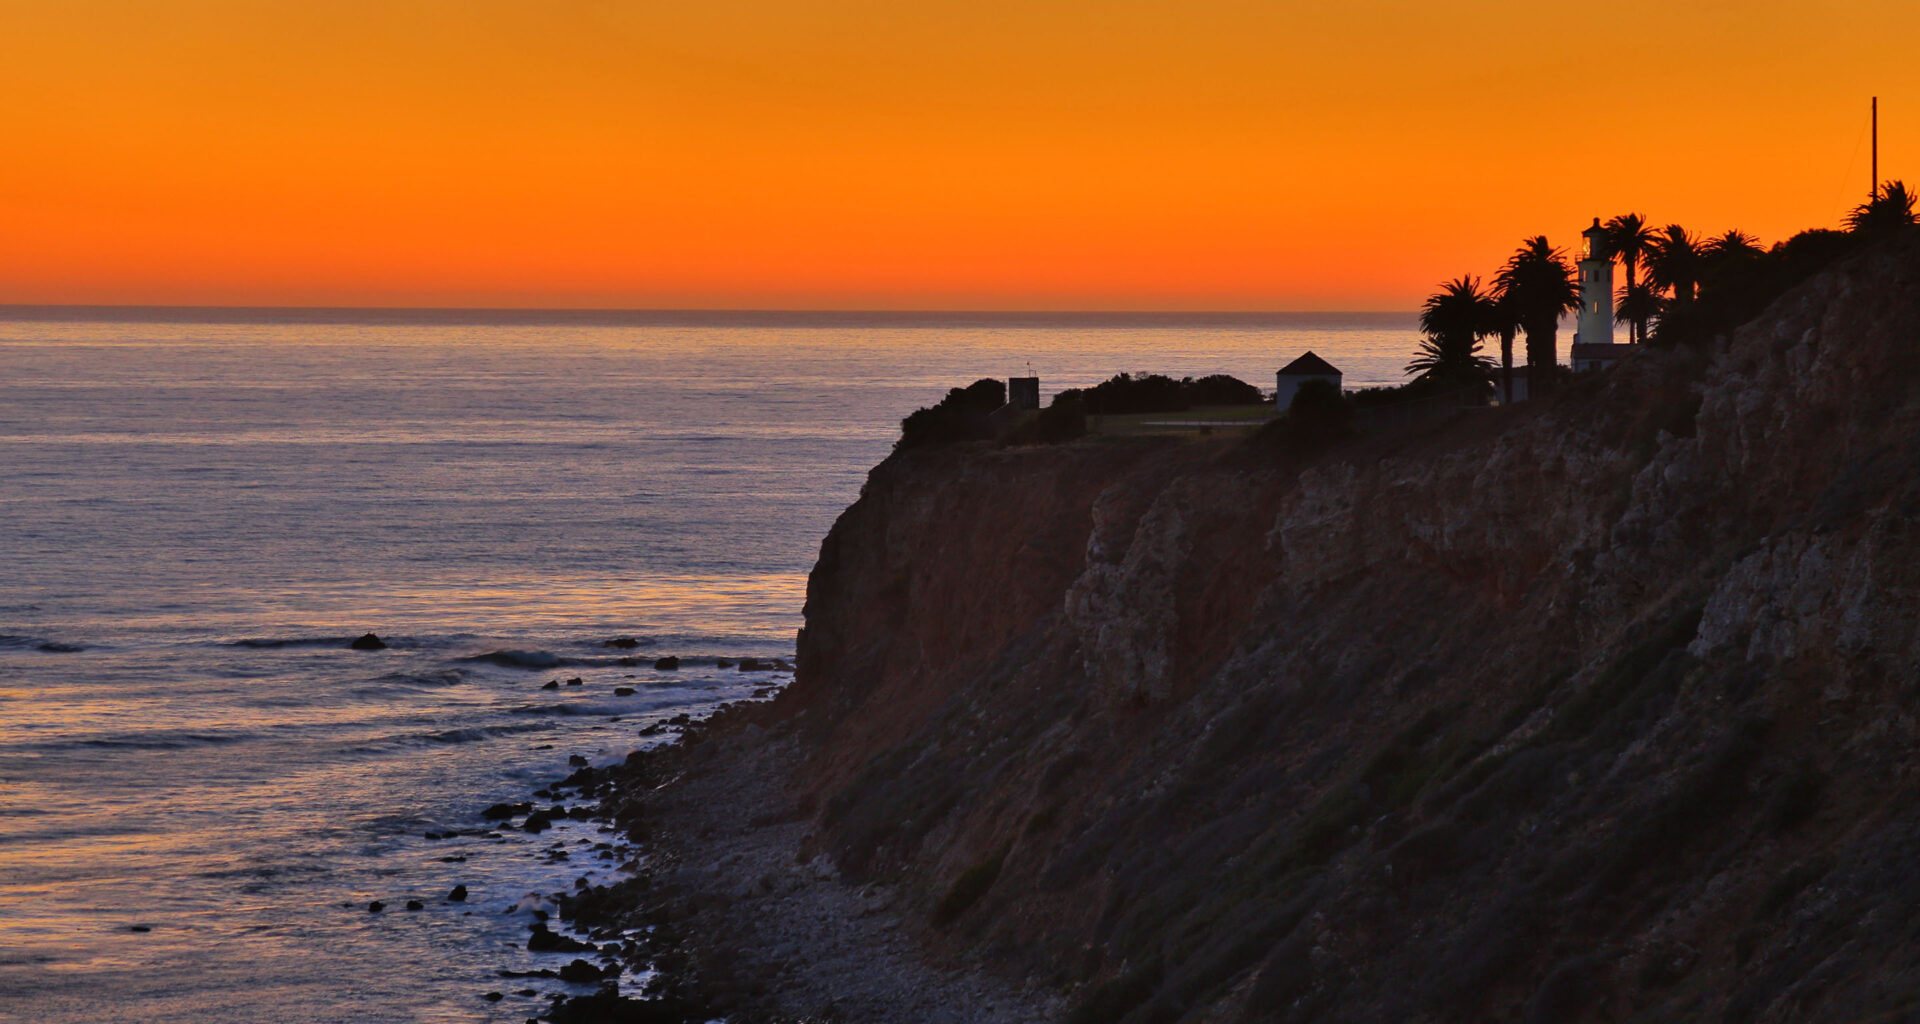 point vicente lighthouse, lighthouse, light house, palos verdes peninsula, rancho palos verdes, rpv,